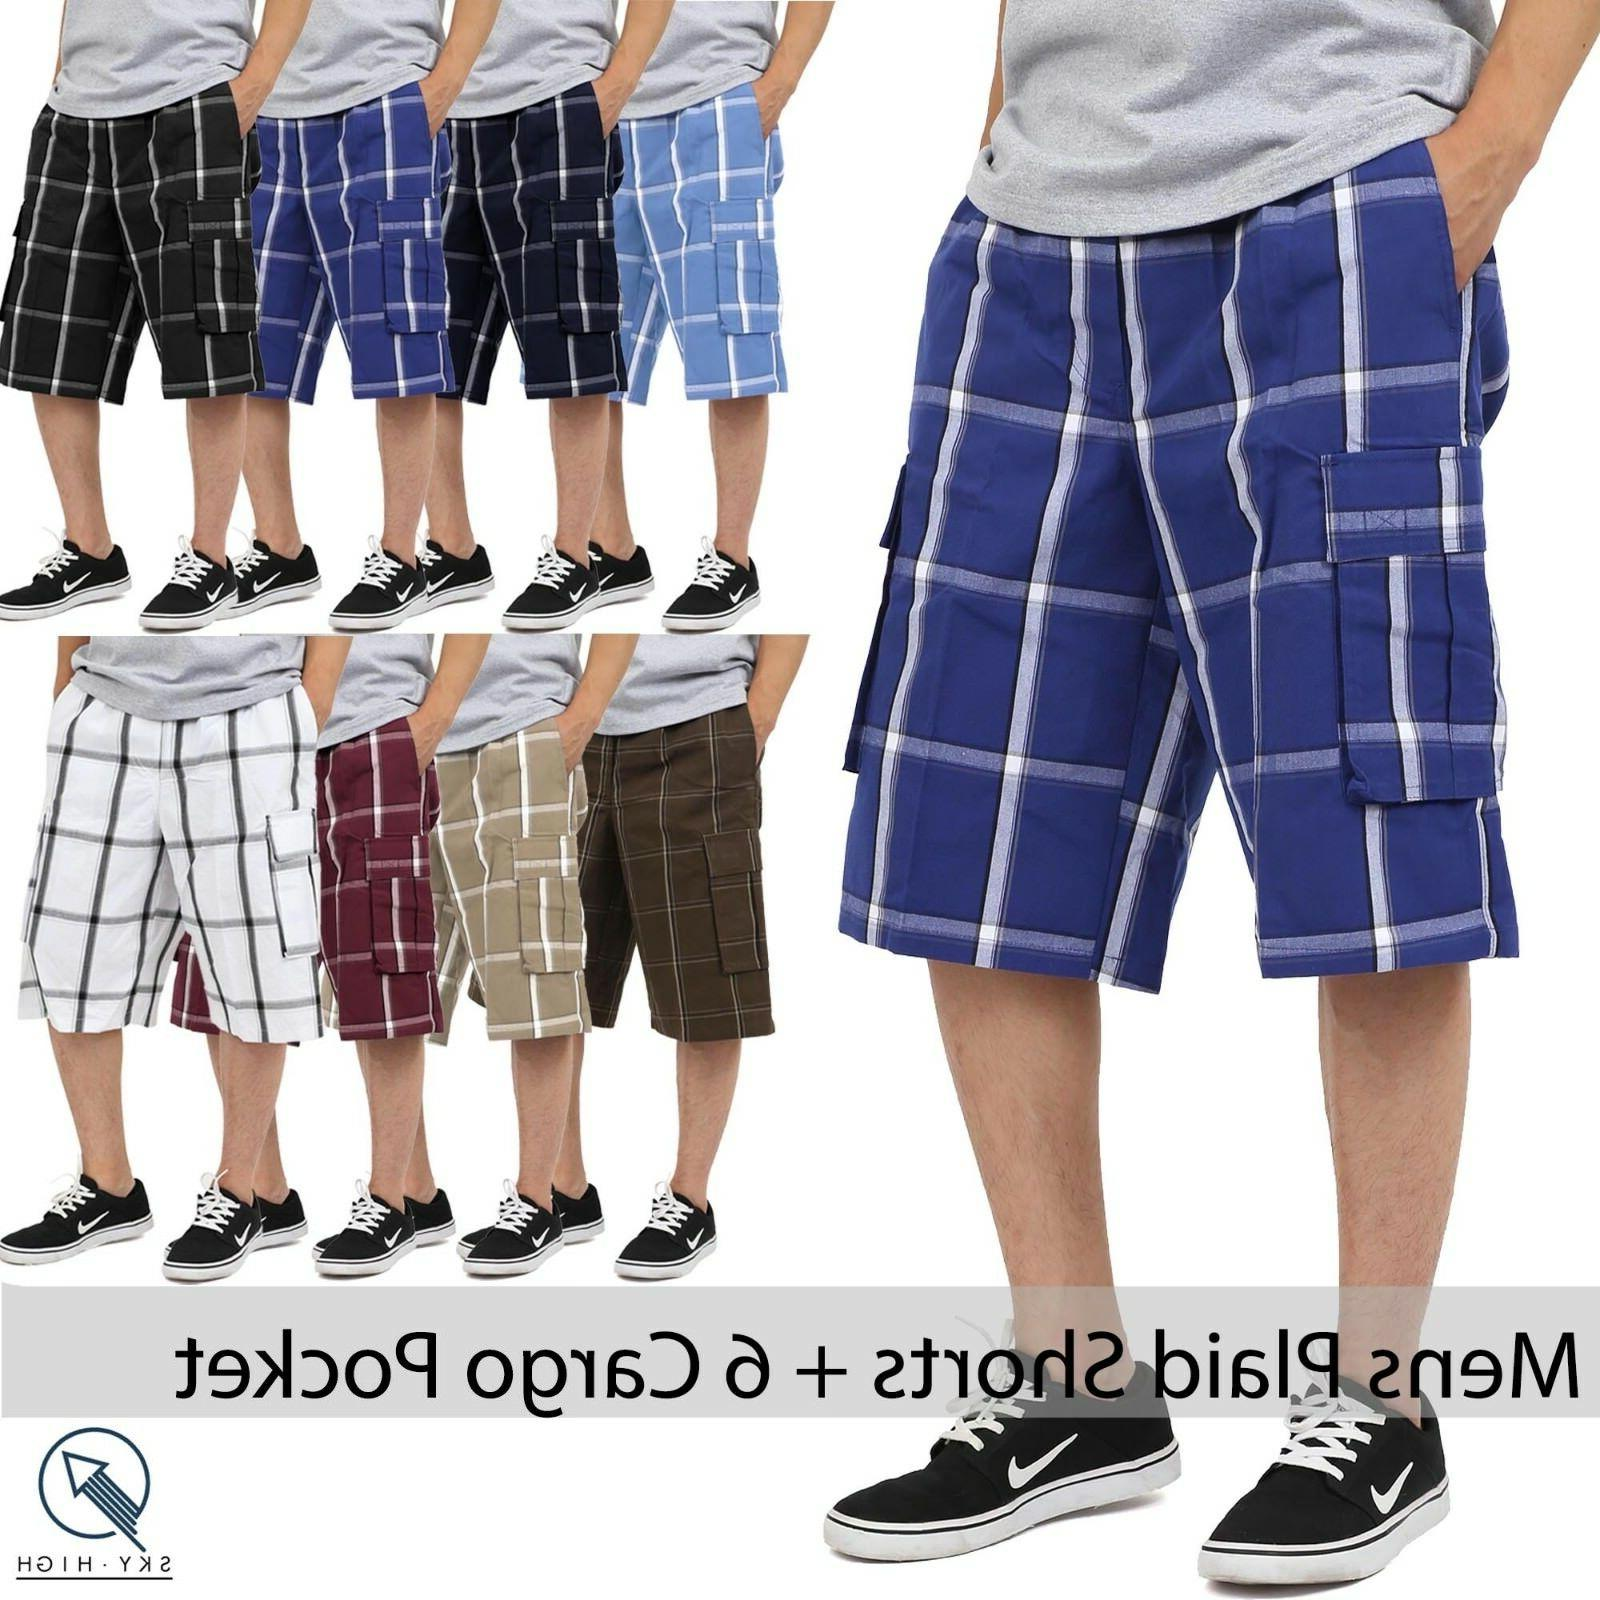 ks mens plaid shorts checkered pants cargo